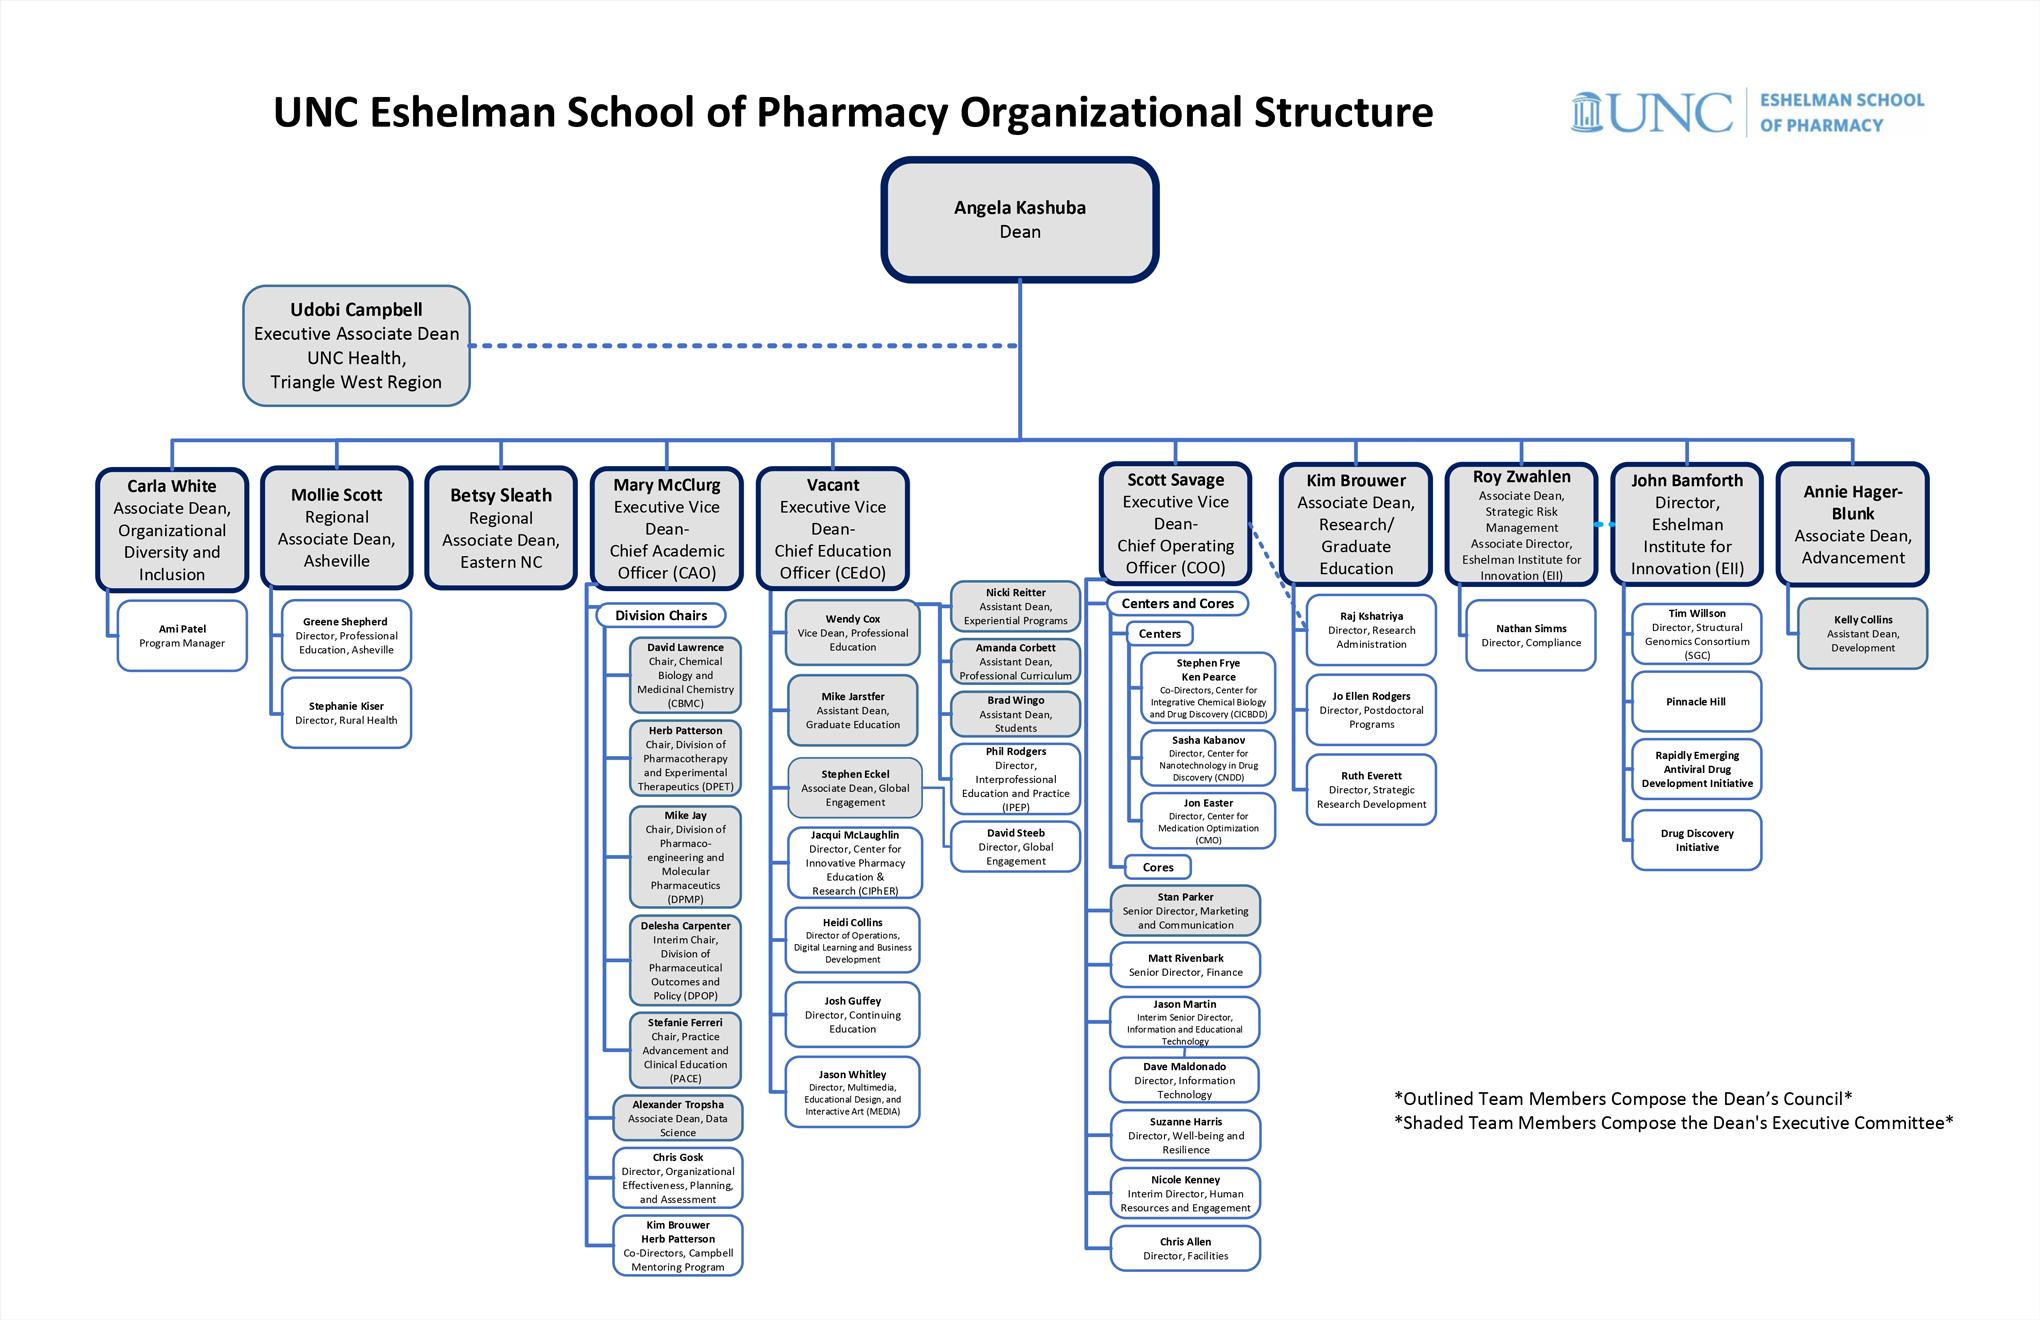 Eshelman-School-of-Pharmacy-Org-Chart-v2.2021.03.26